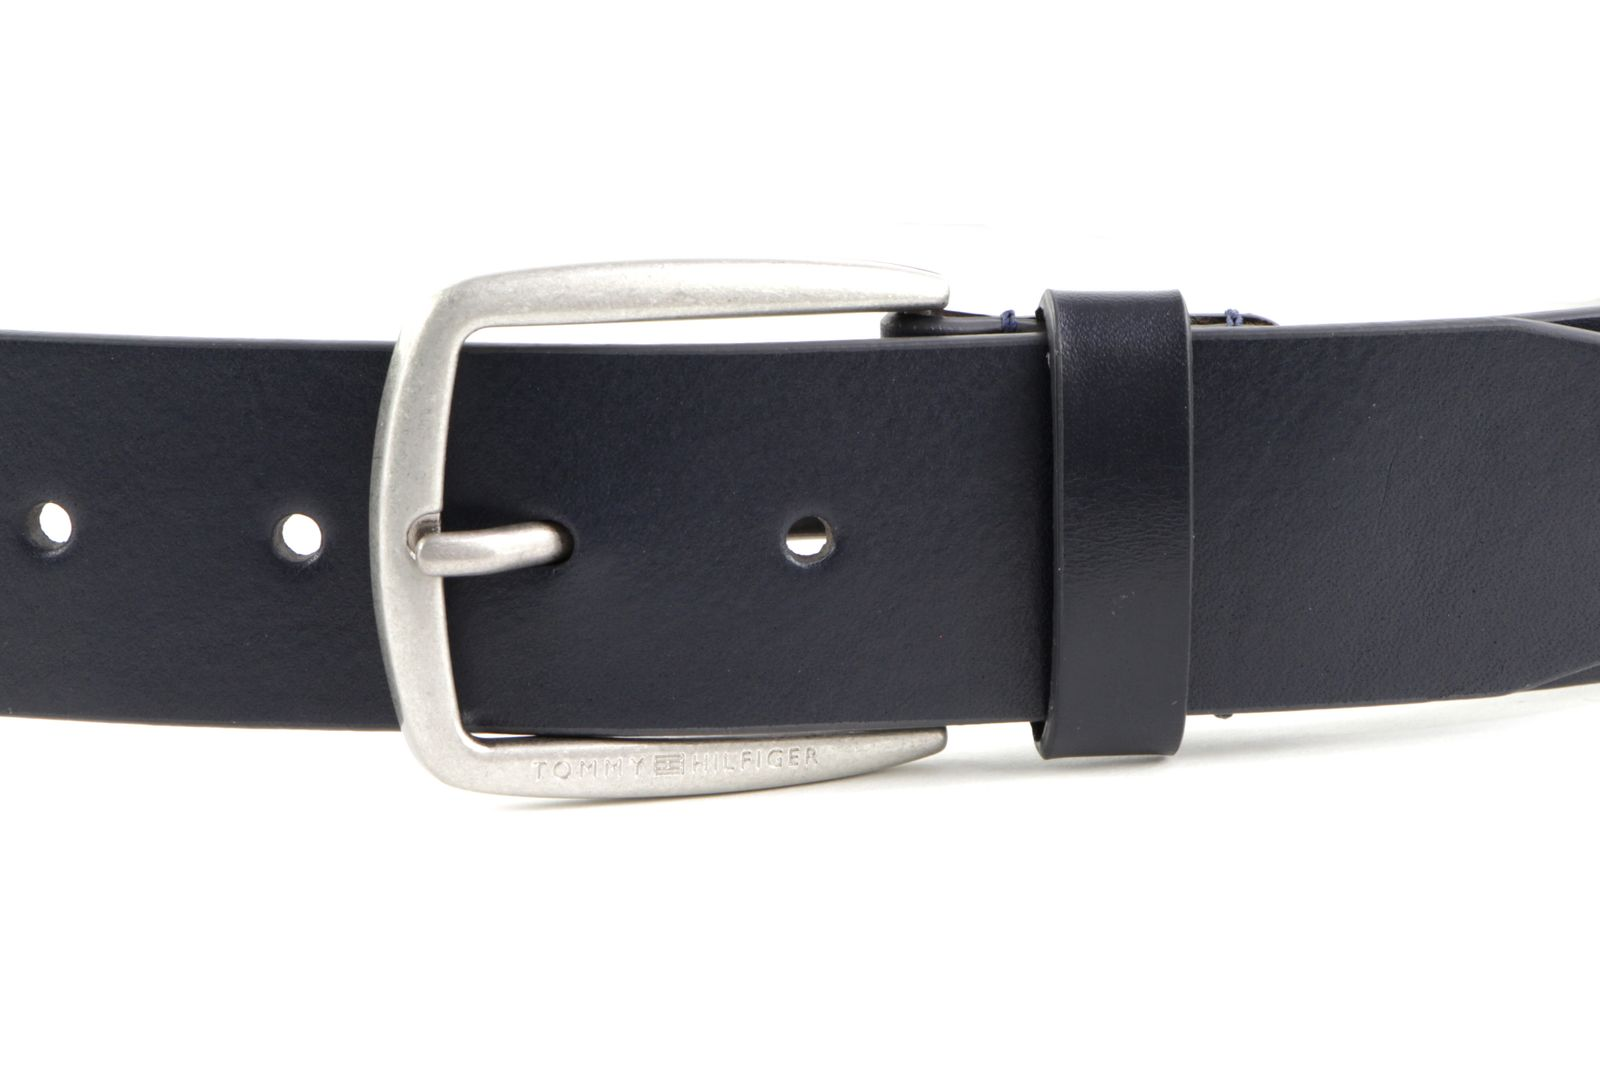 TOMMY HILFIGER Modern Leather Belt 4.0 W105 Desert Sky